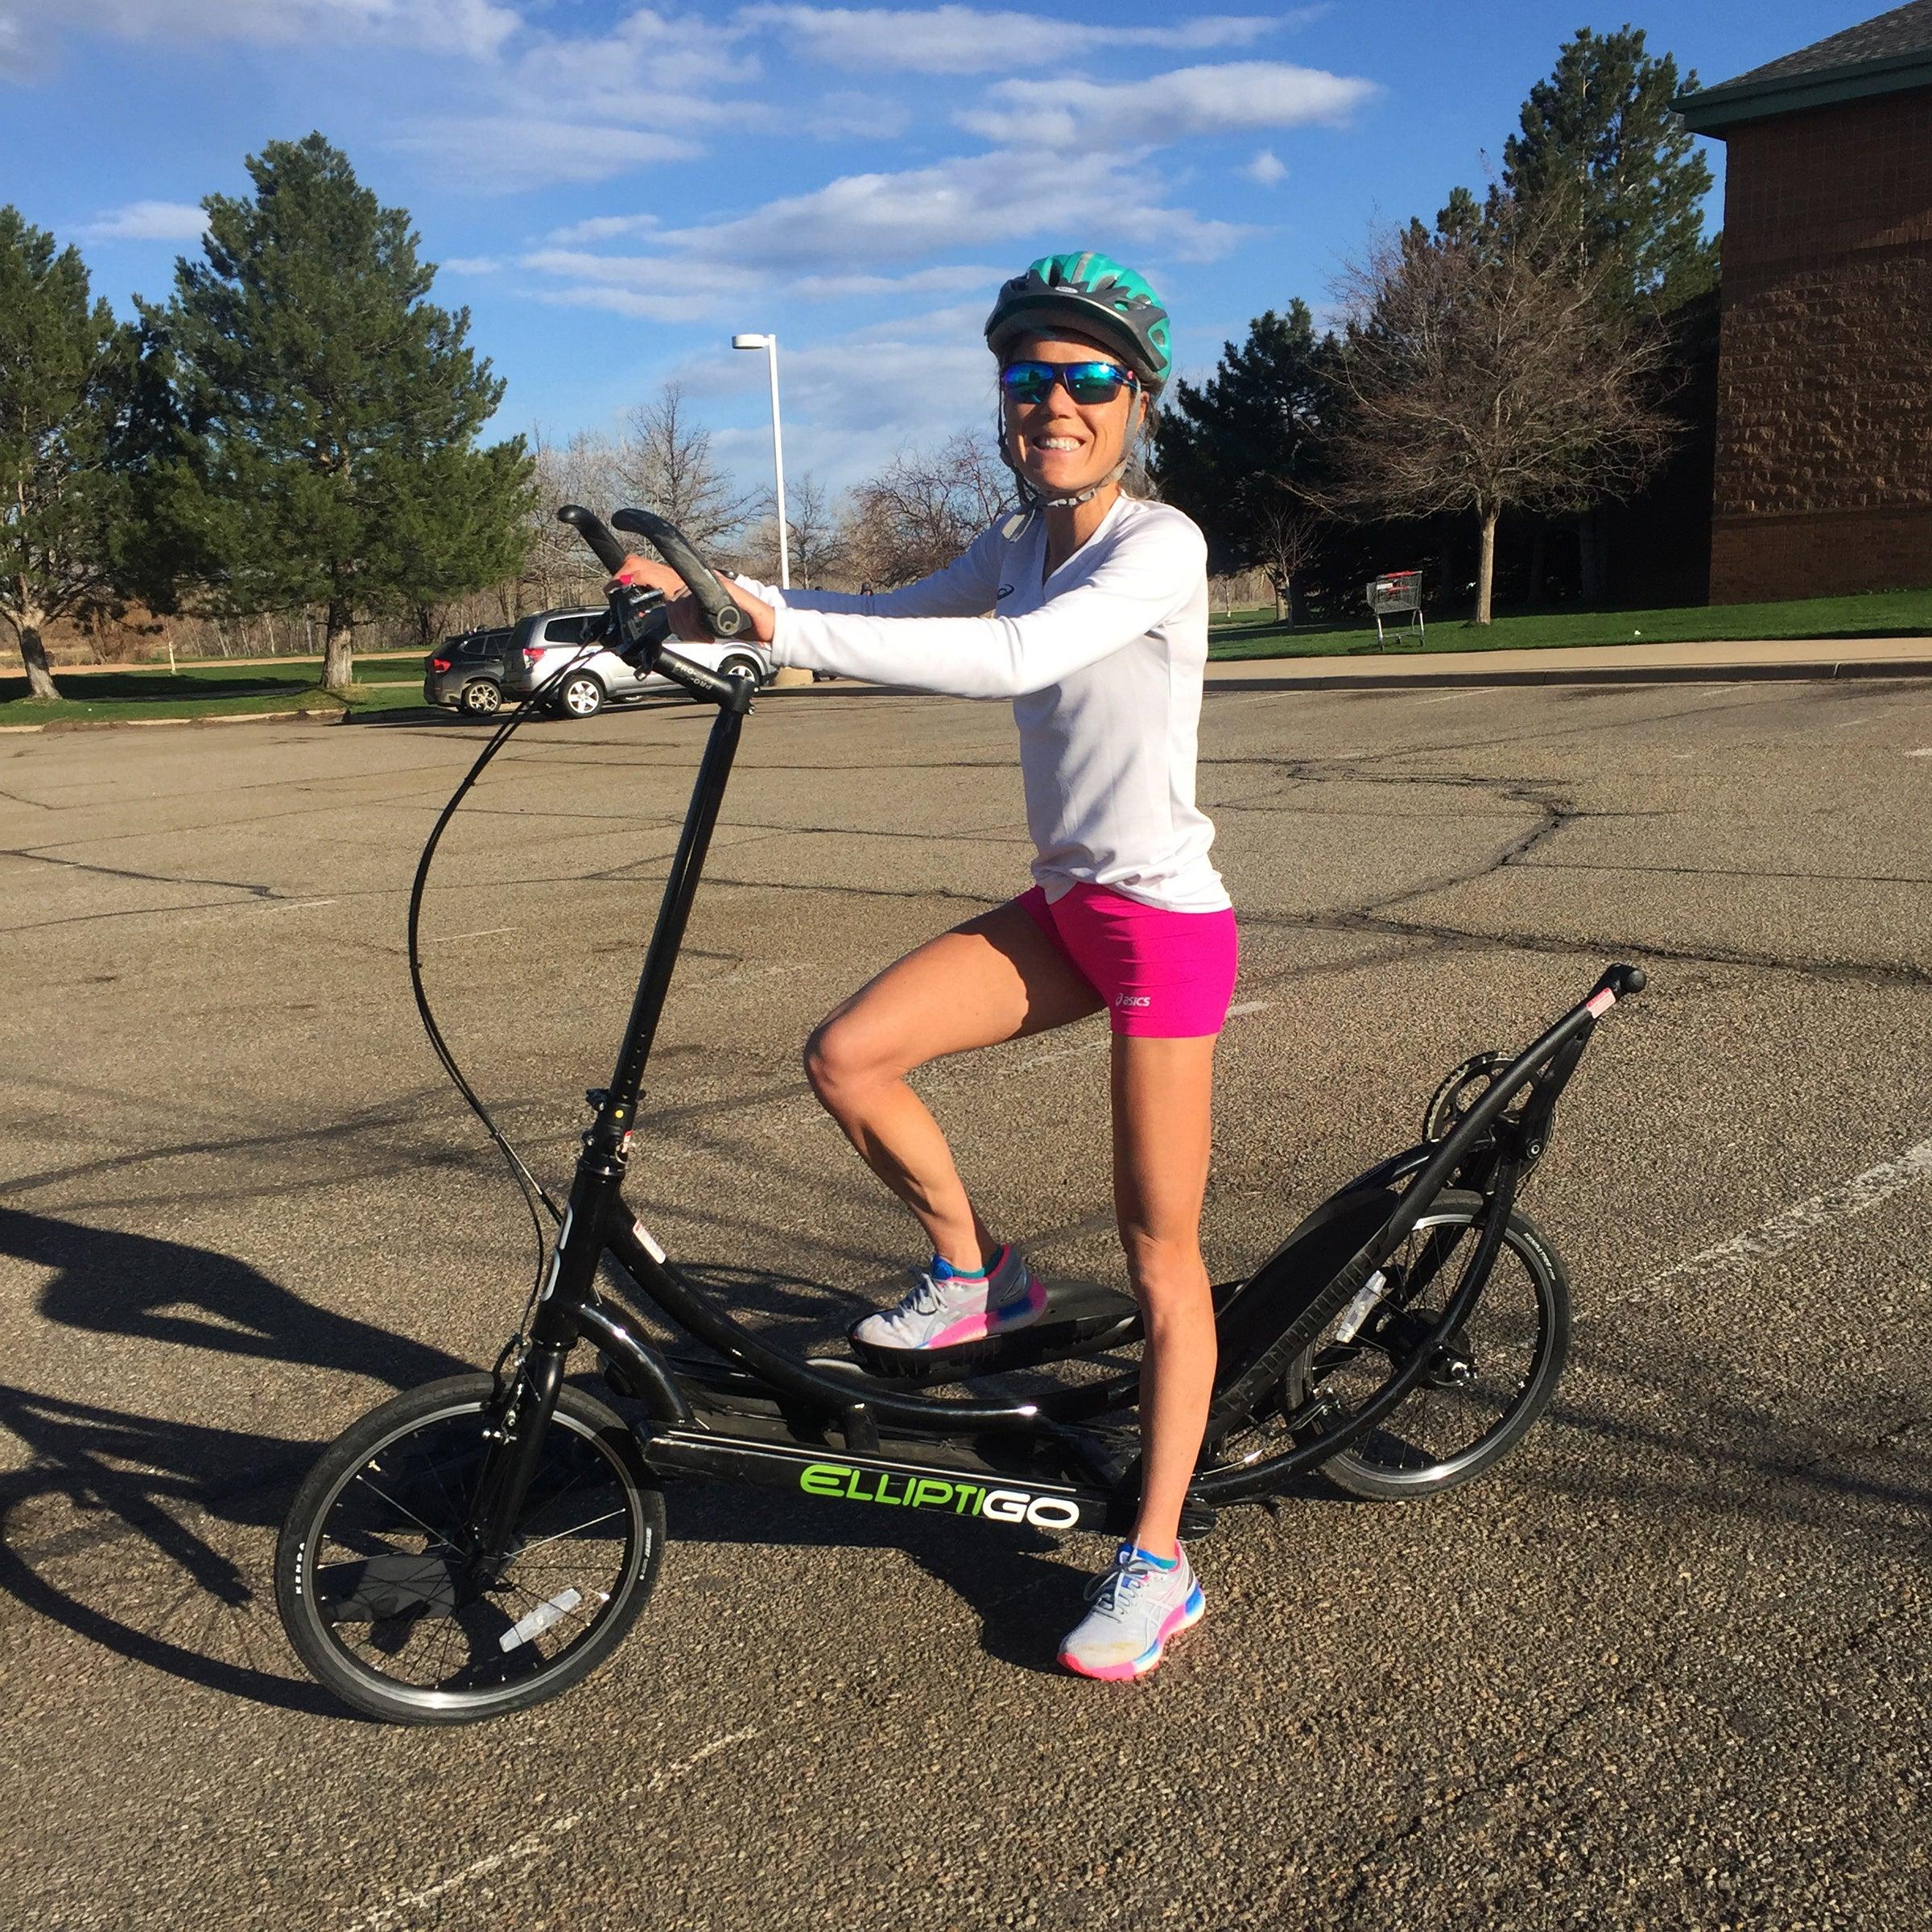 Lindsay Flanagan training on Elliptigo